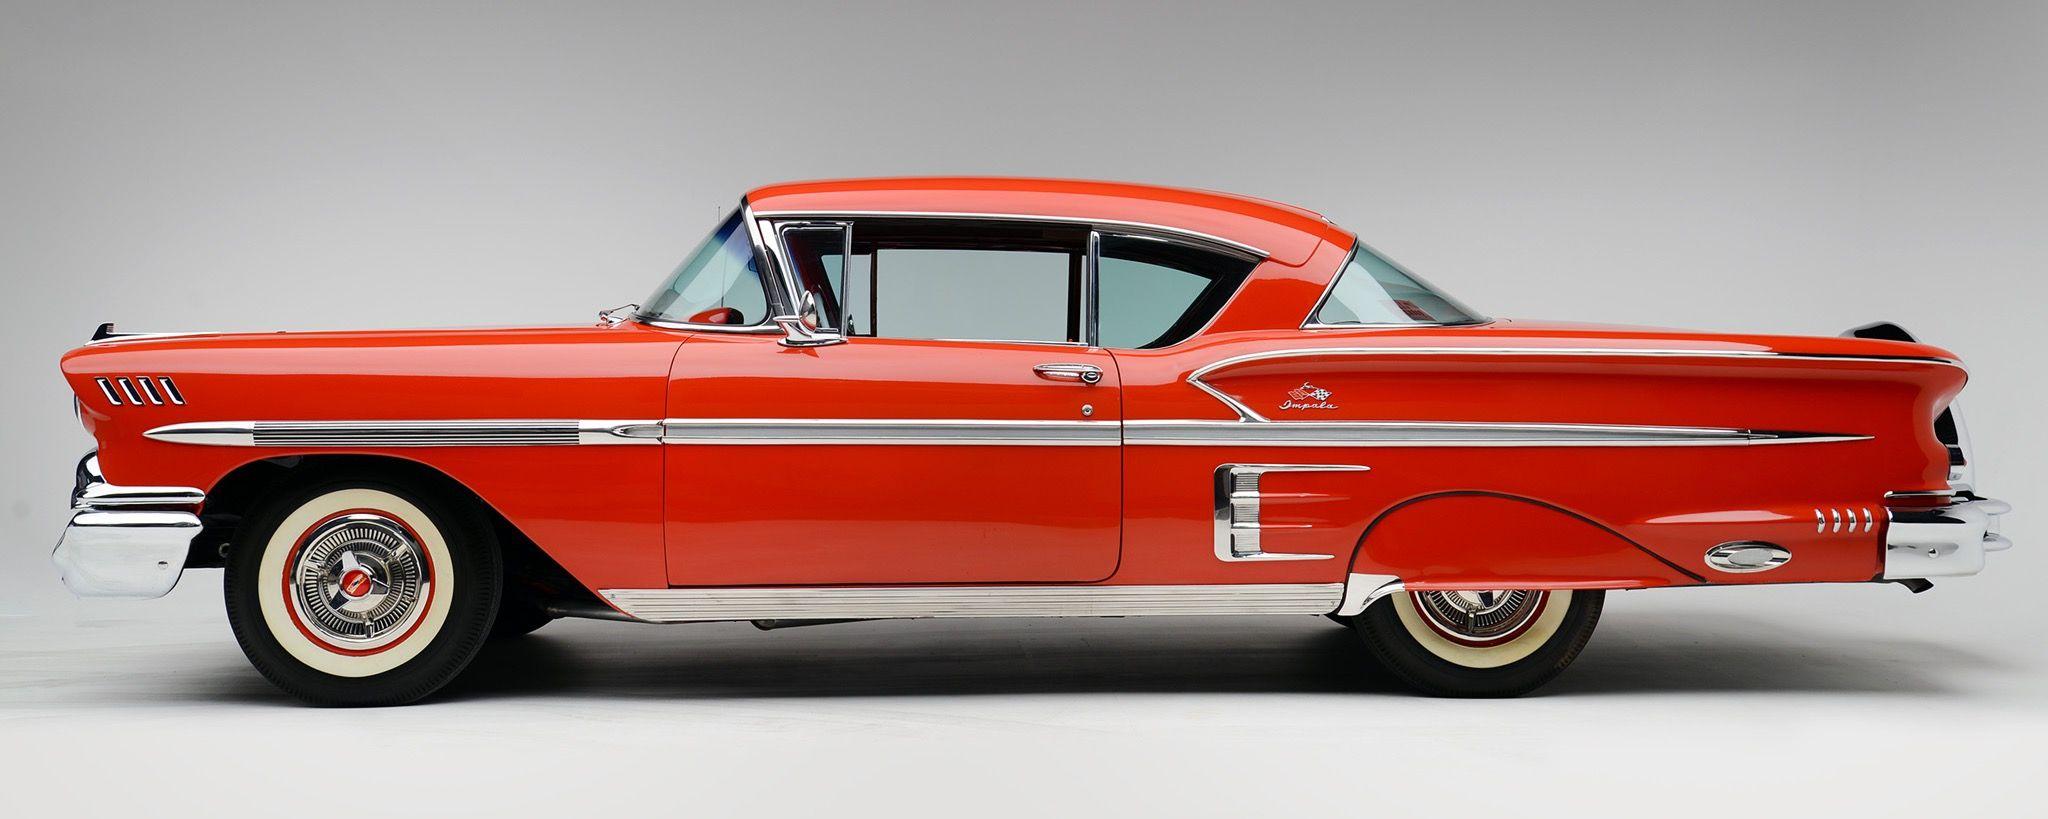 1958 Chevrolet Bel Air Impala Sport Coupe Chevrolet Chevrolet Bel Air Vintage Cars 1950s